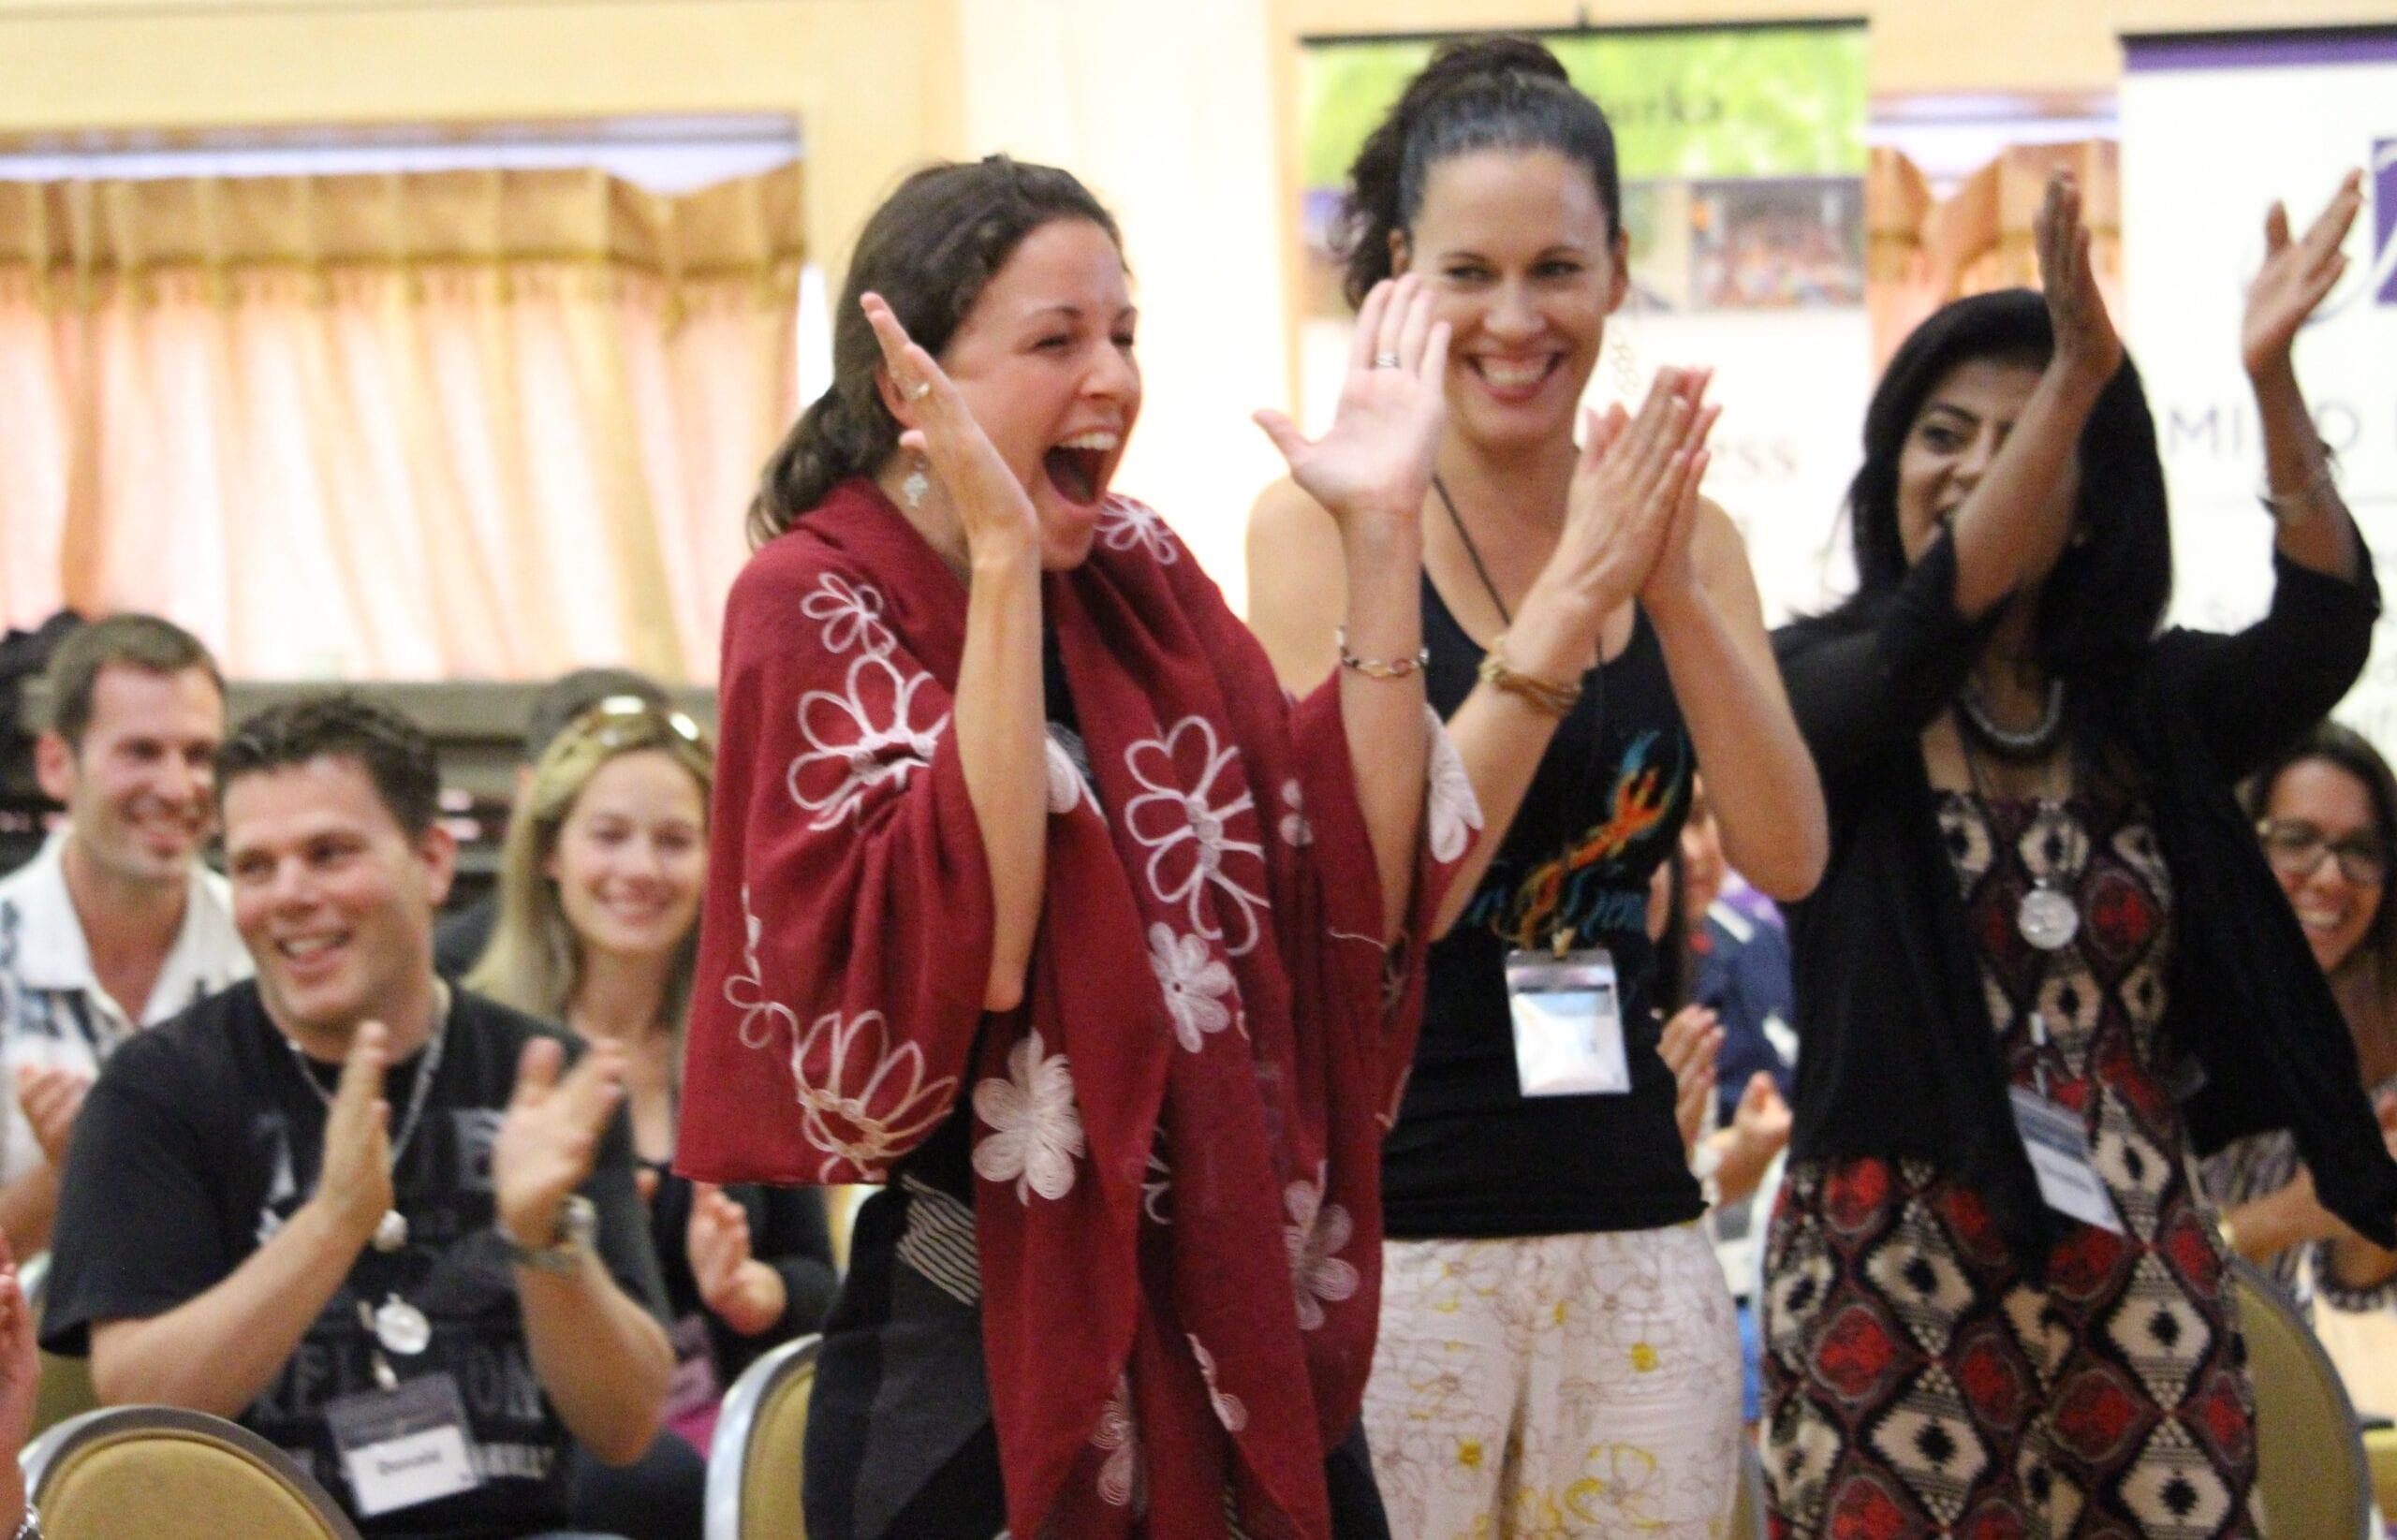 Niurka_participants_clapping_blog_personal_transformation